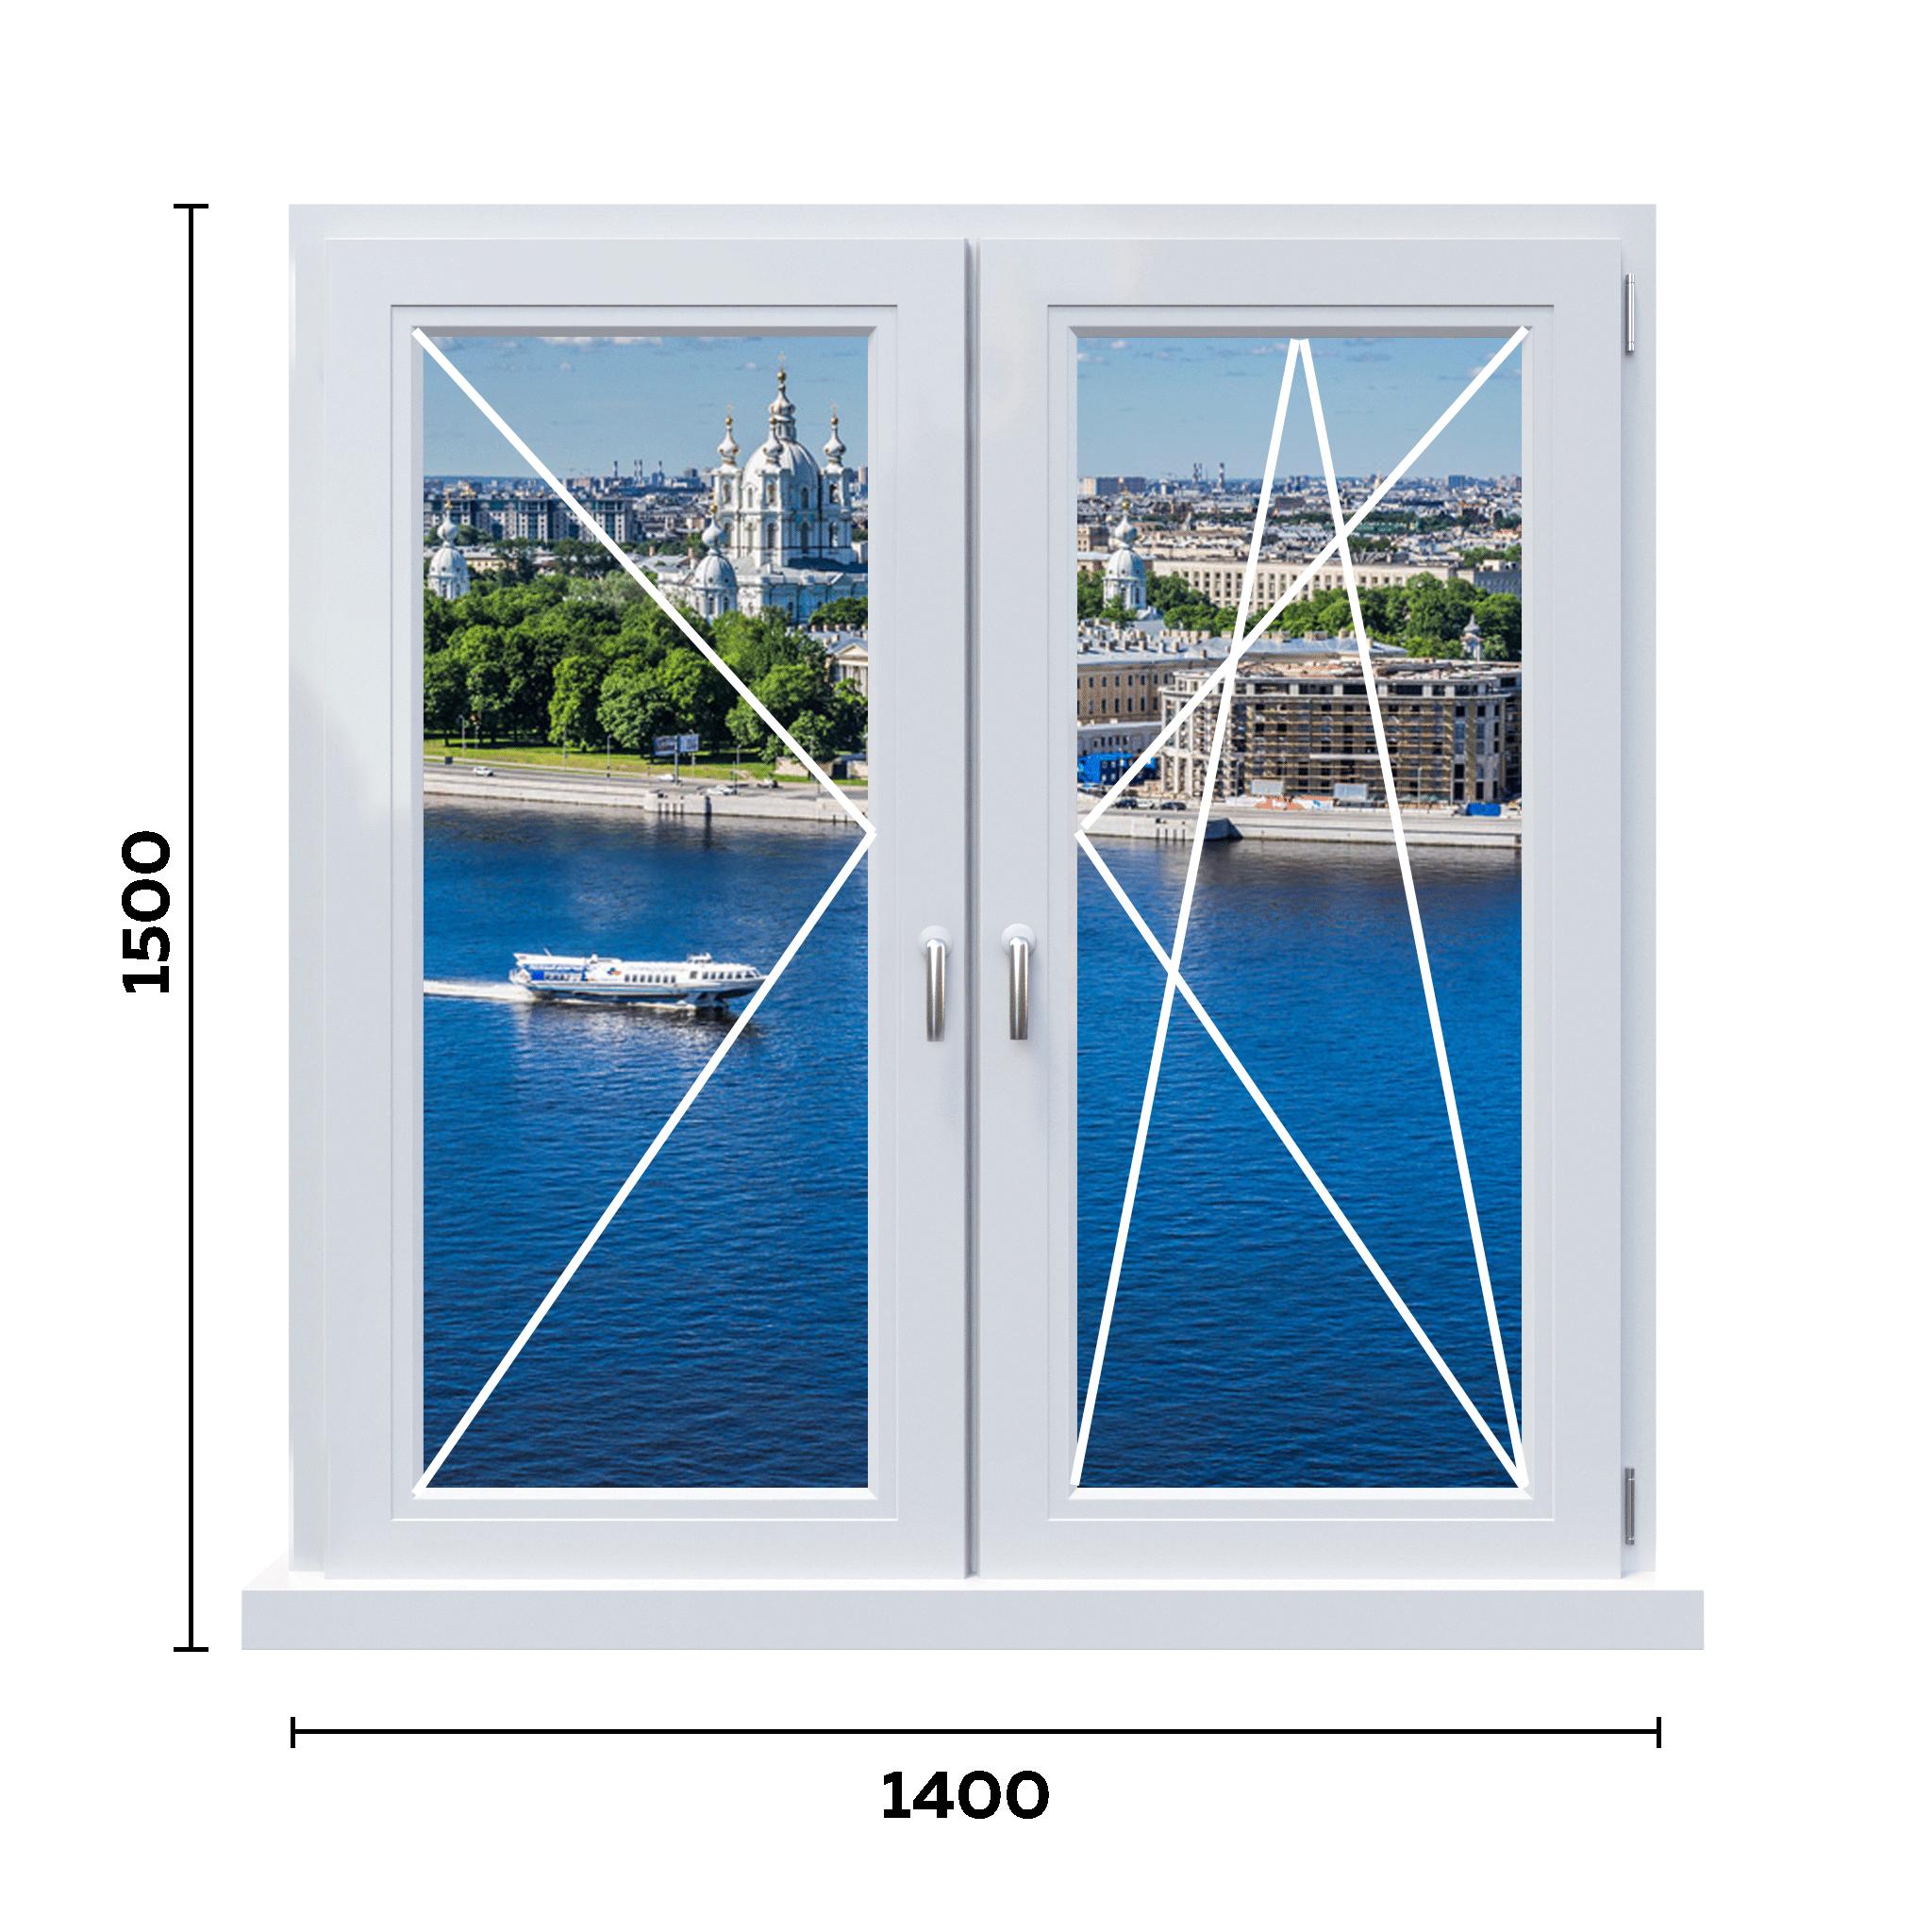 схема двухстворчатого окна 650 мм с двумя ручками